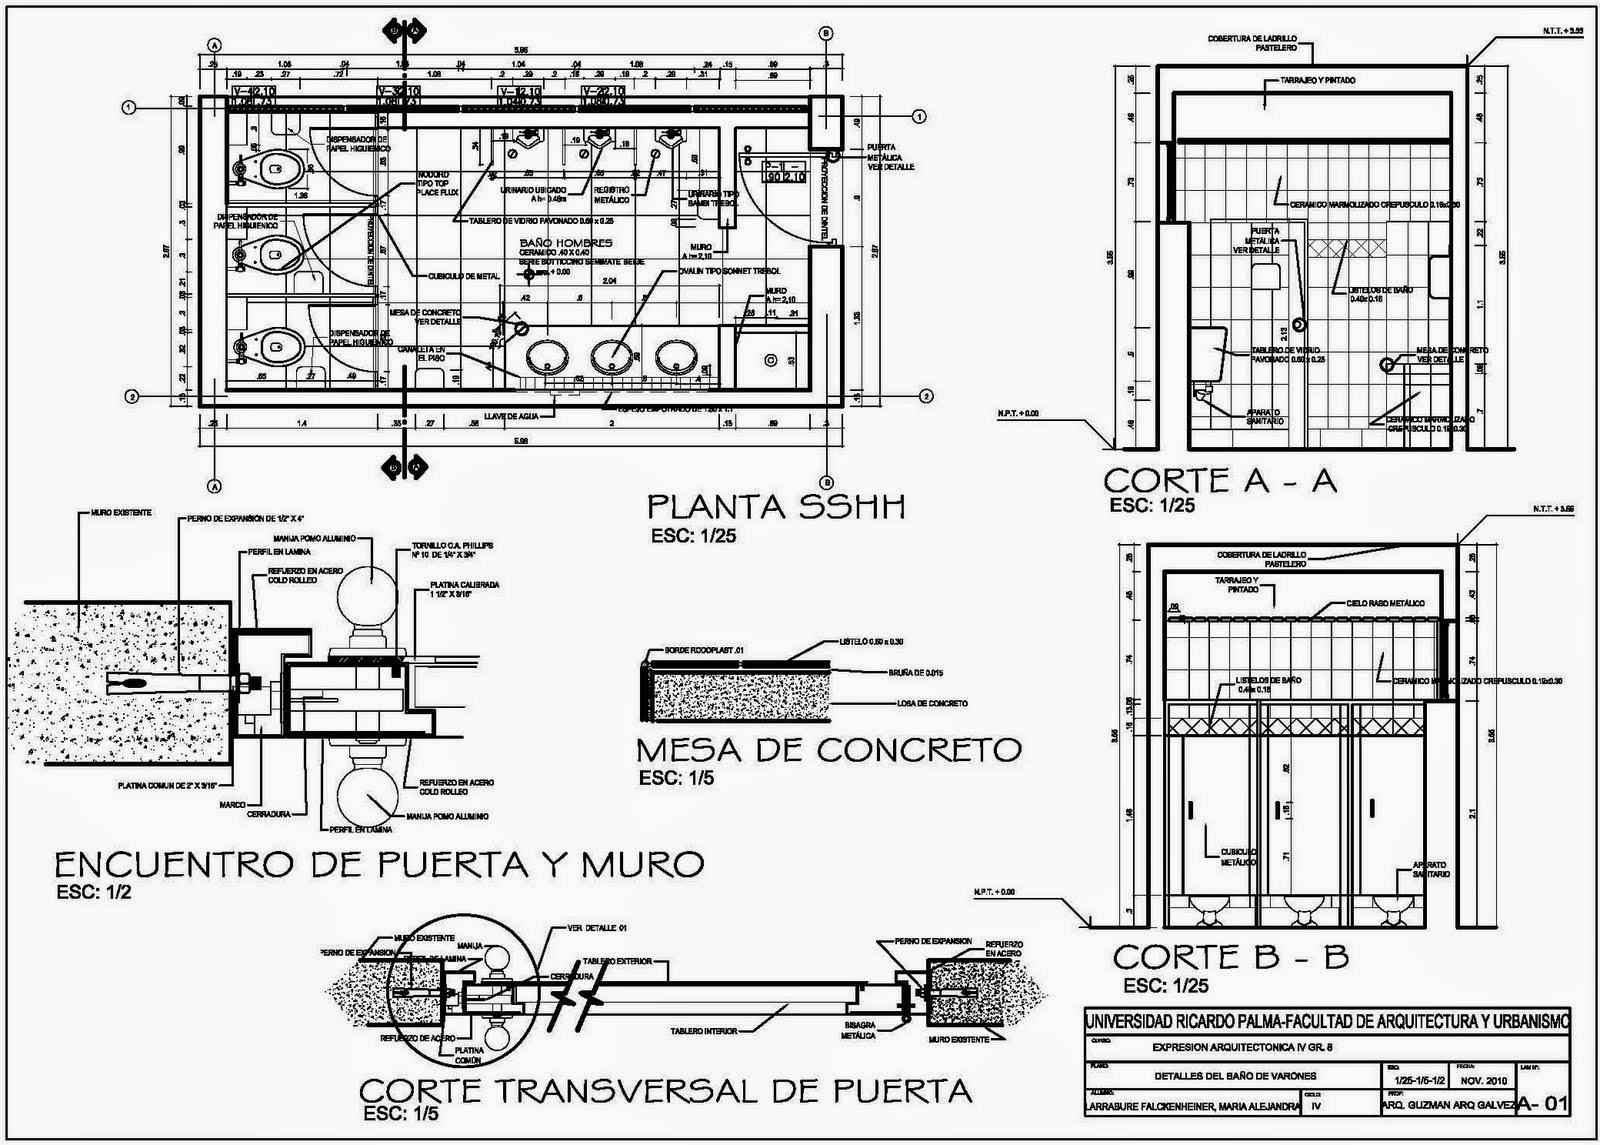 Dibujo t cnico dibujo arquitect nico for Planos de cocina en linea